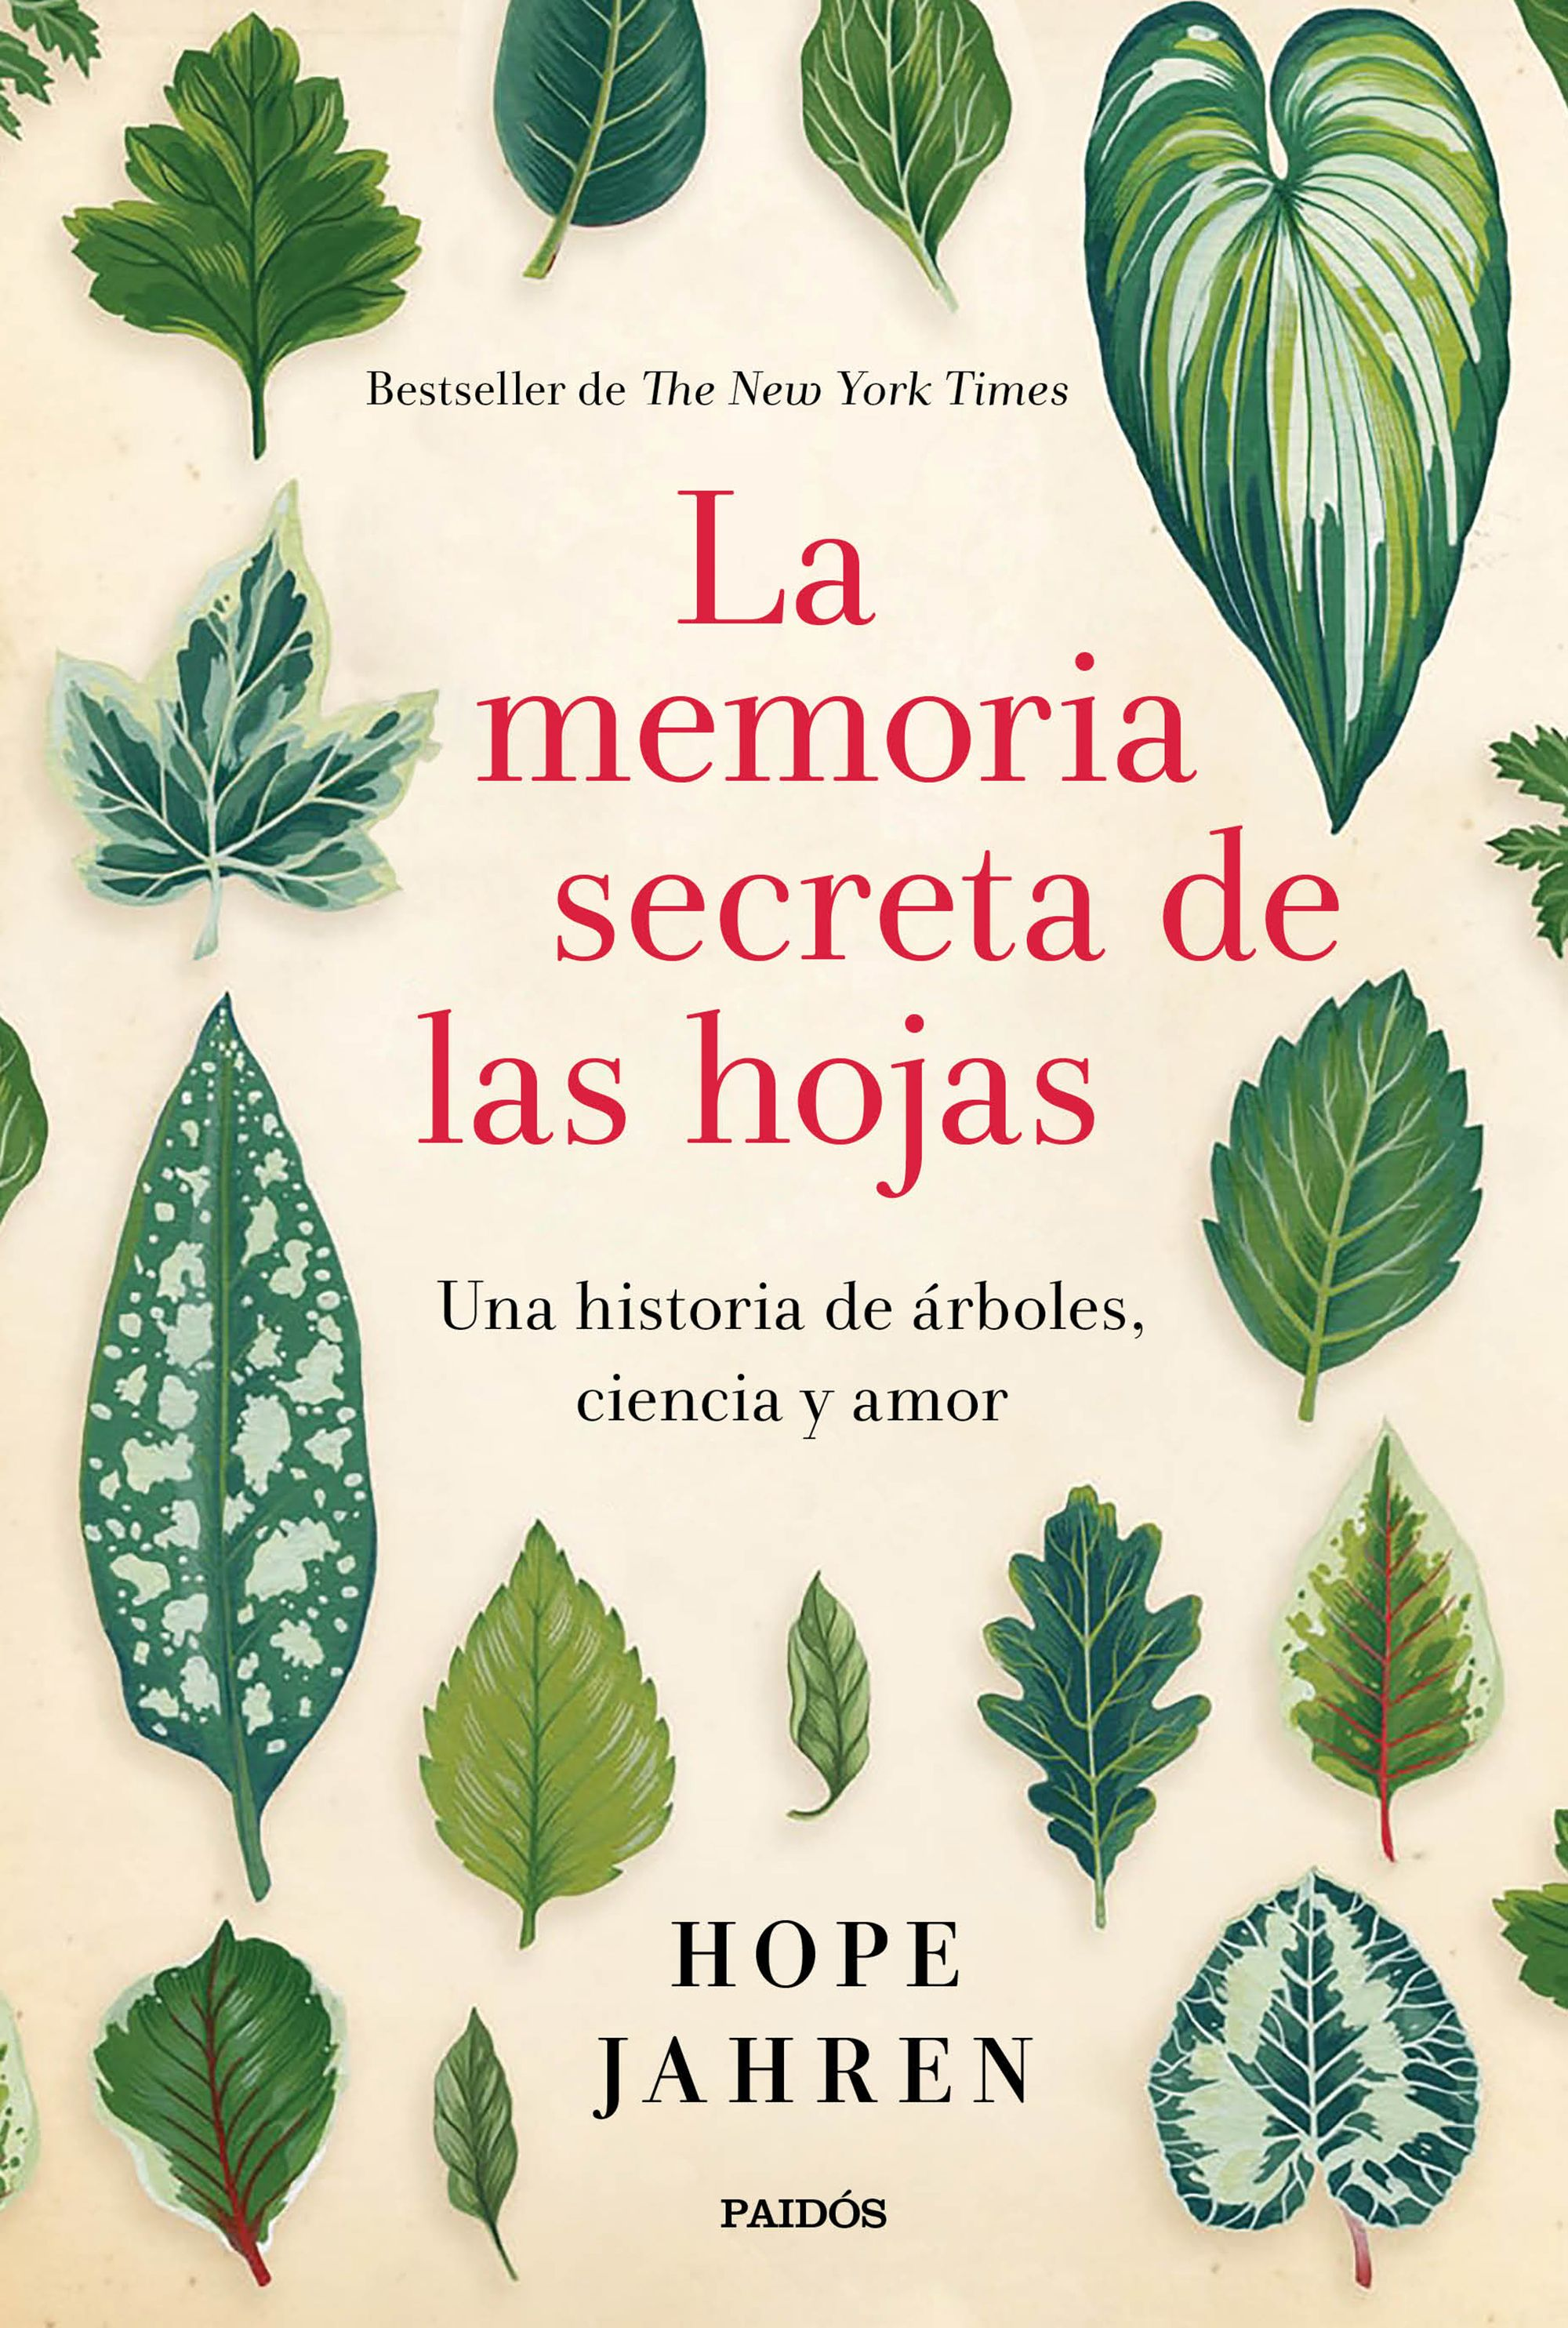 La memoria secreta de las hojas   Planeta de Libros